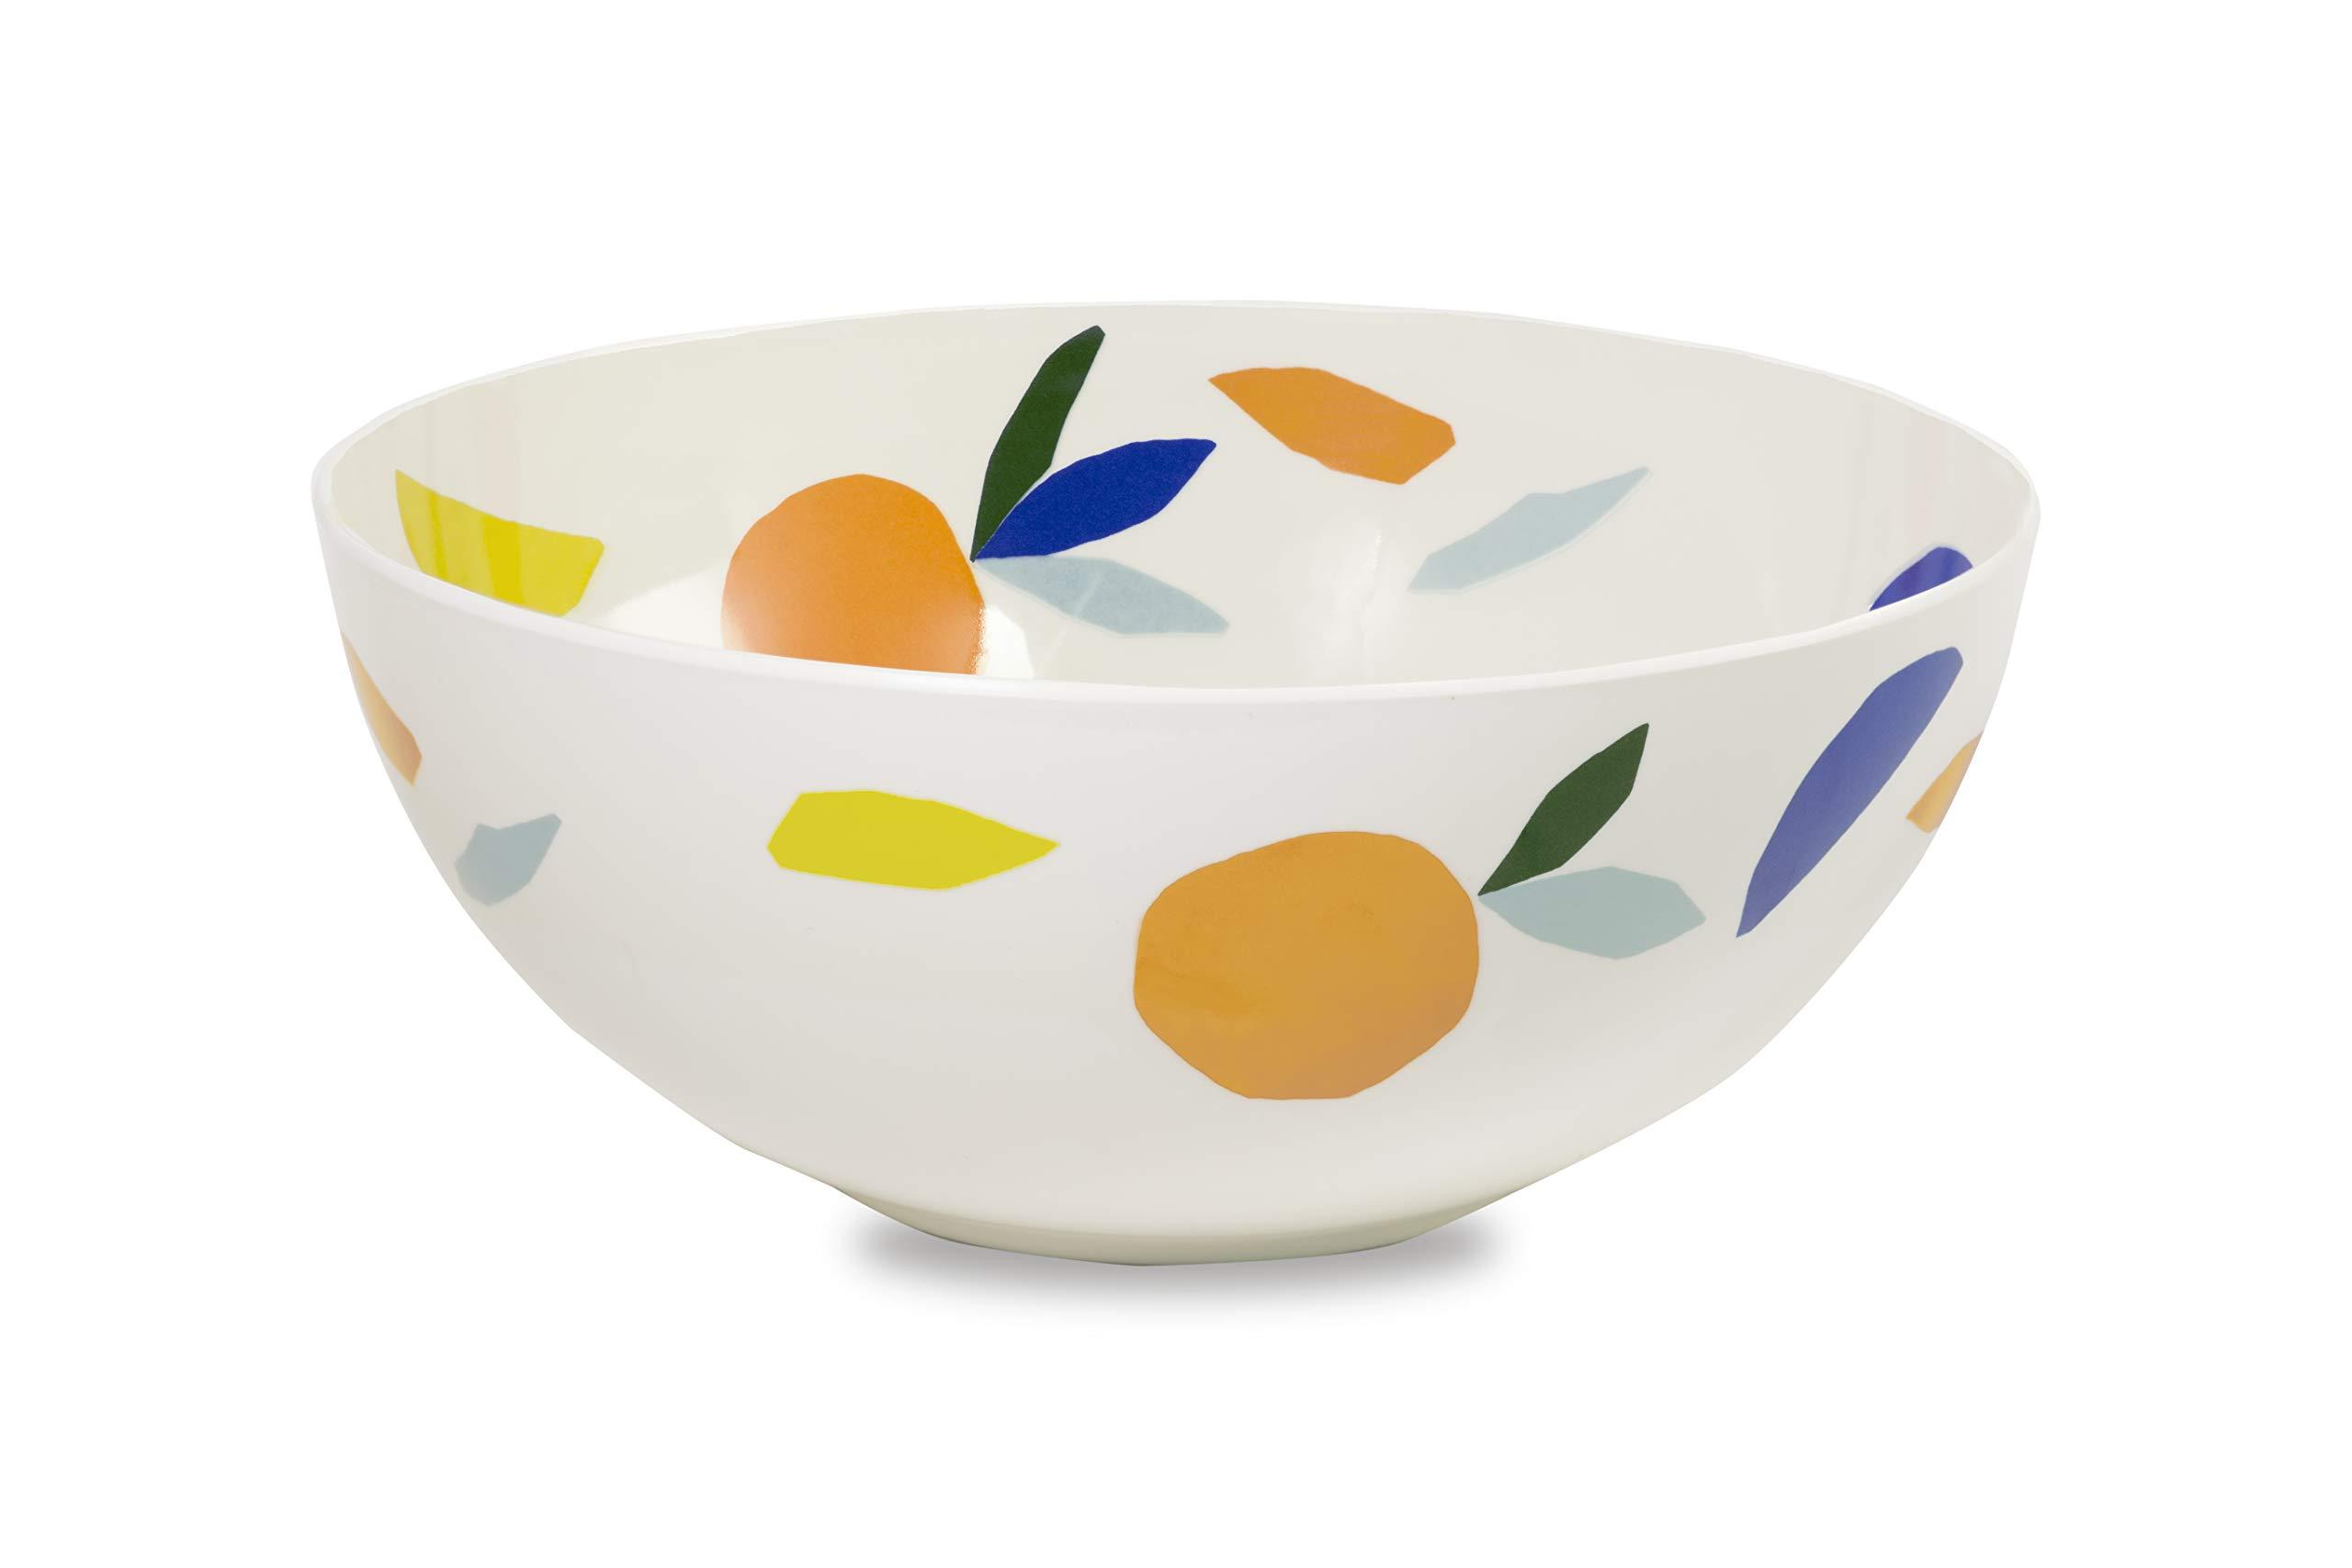 Kate Spade New York Women's Melamine Serving Bowl, Dishwasher Safe, Citrus Twist